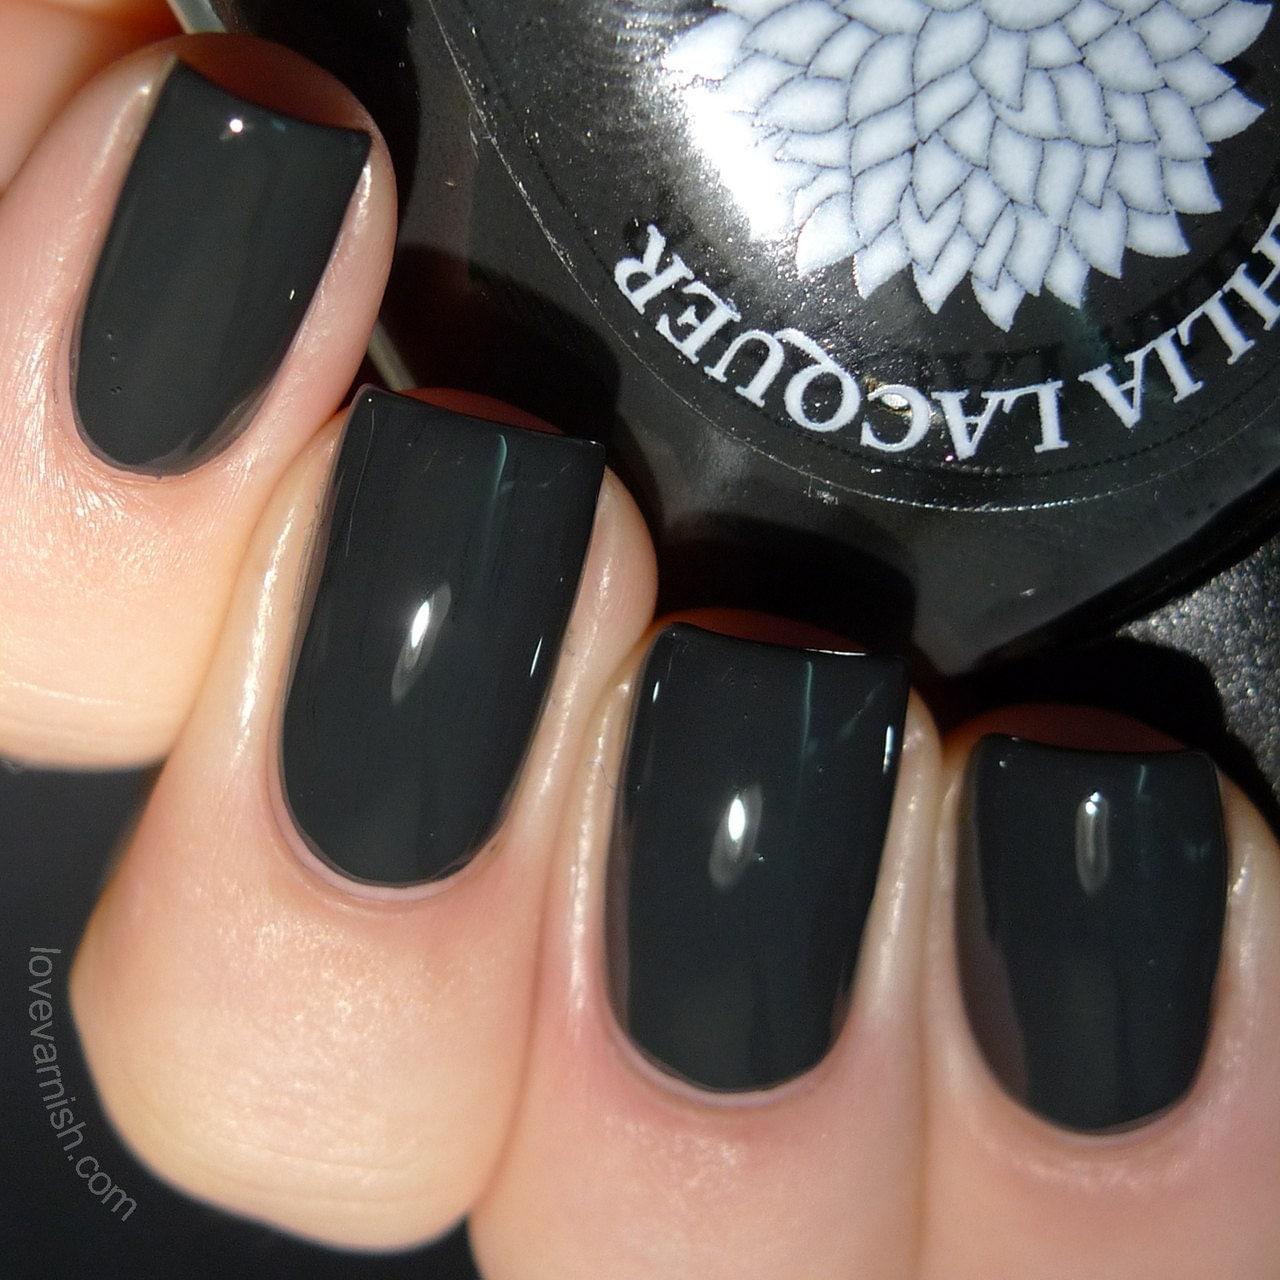 Black Nail Polish What Does It Mean: Off Black Nail Polish By Black Dahlia Lacquer Black Iris